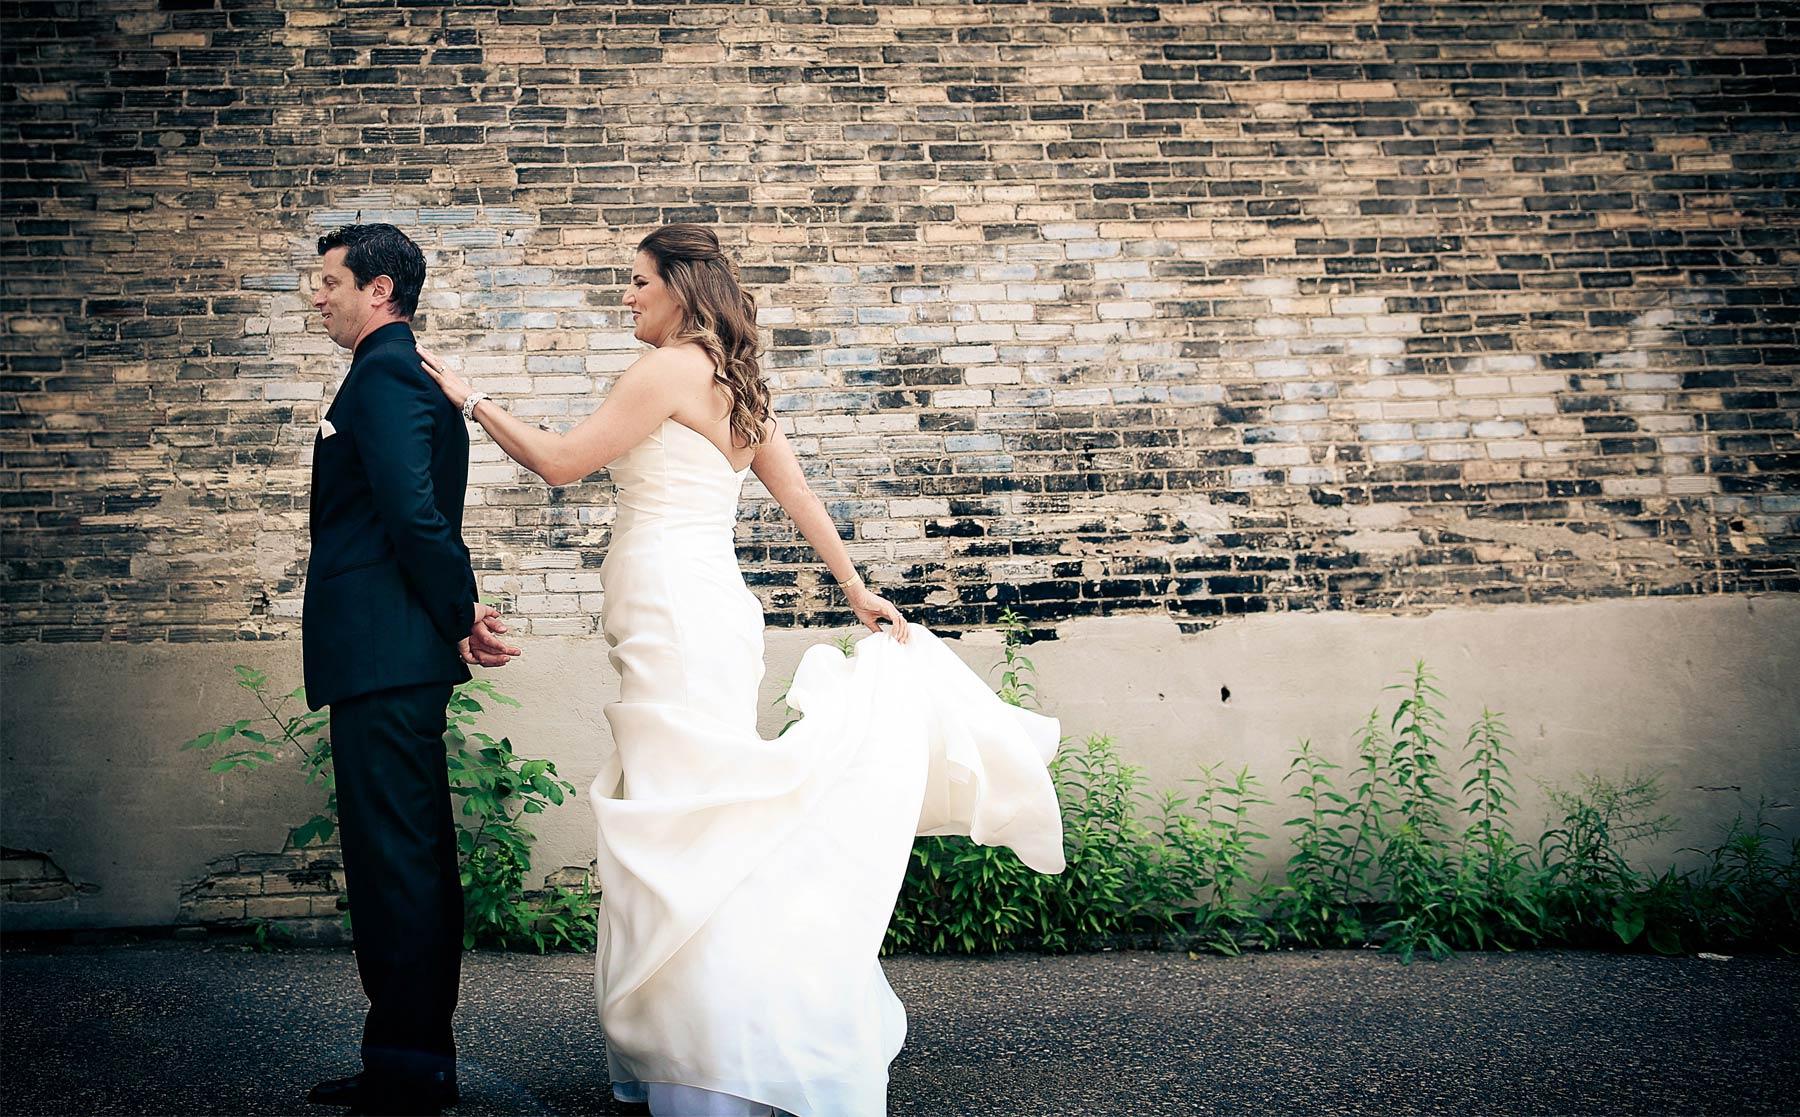 02-Minneapolis-Minnesota-Wedding-Photography-by-Vick-Photography-Aria-Downtown-First-Look-Layne-&-Dan.jpg